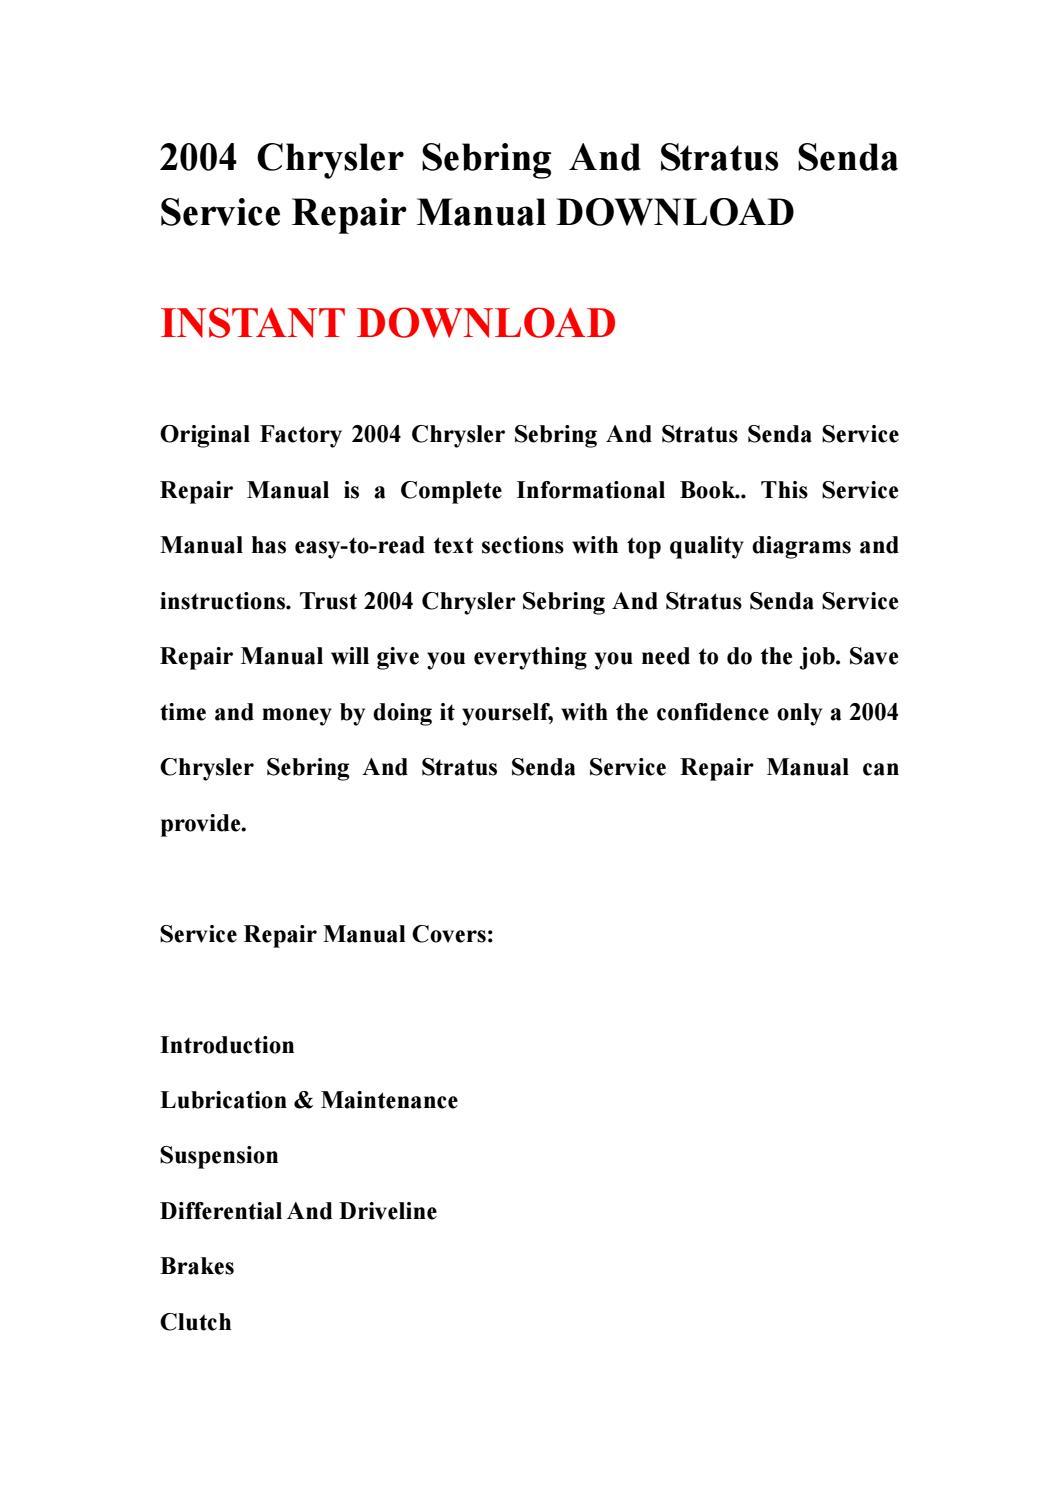 2004 chrysler sebring and stratus senda service repair manual download by  kmsjnfhse - issuu